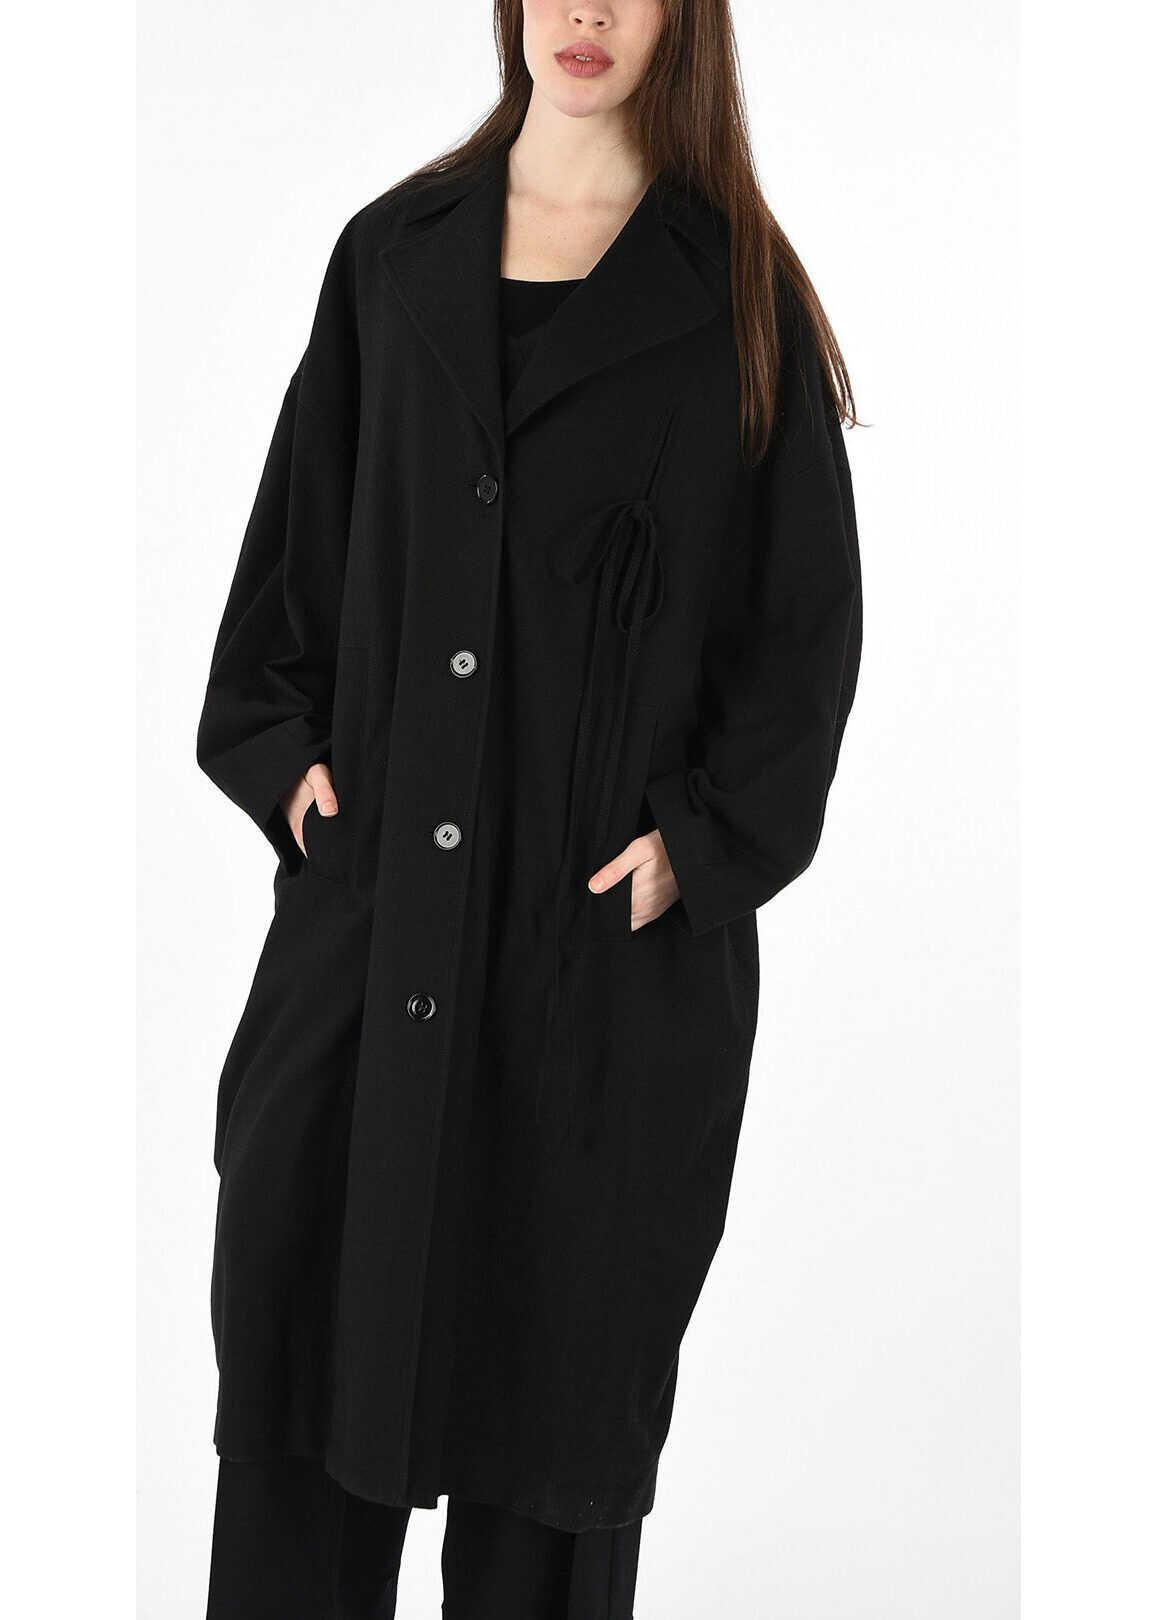 Maison Margiela MM6 Cotton and Virgin Wool Single Breasted Coat BLACK